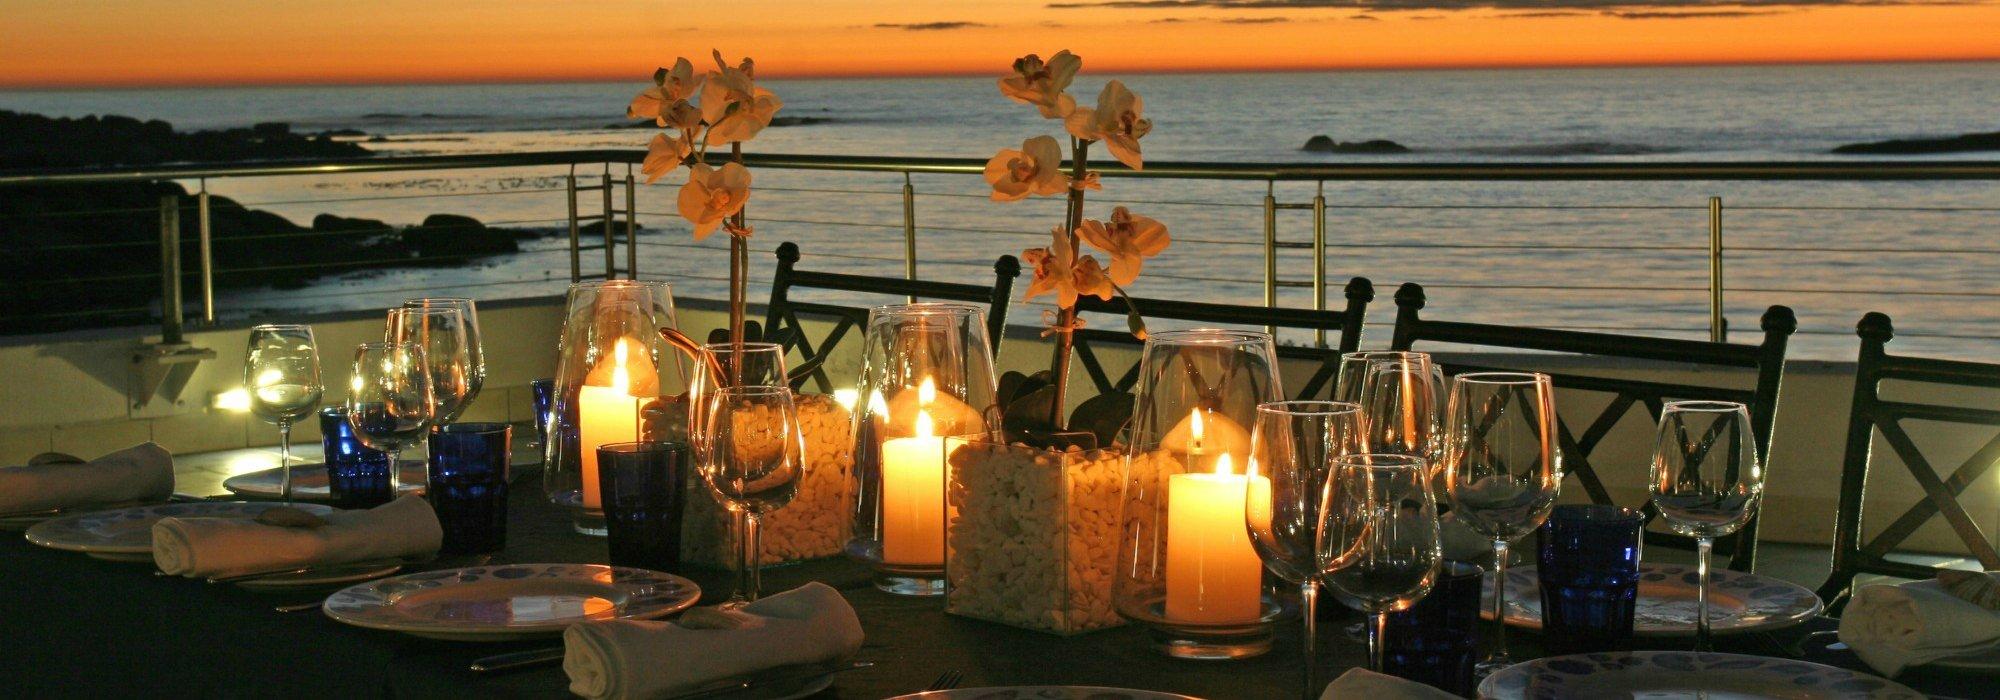 Azure restaurant in Cape Town